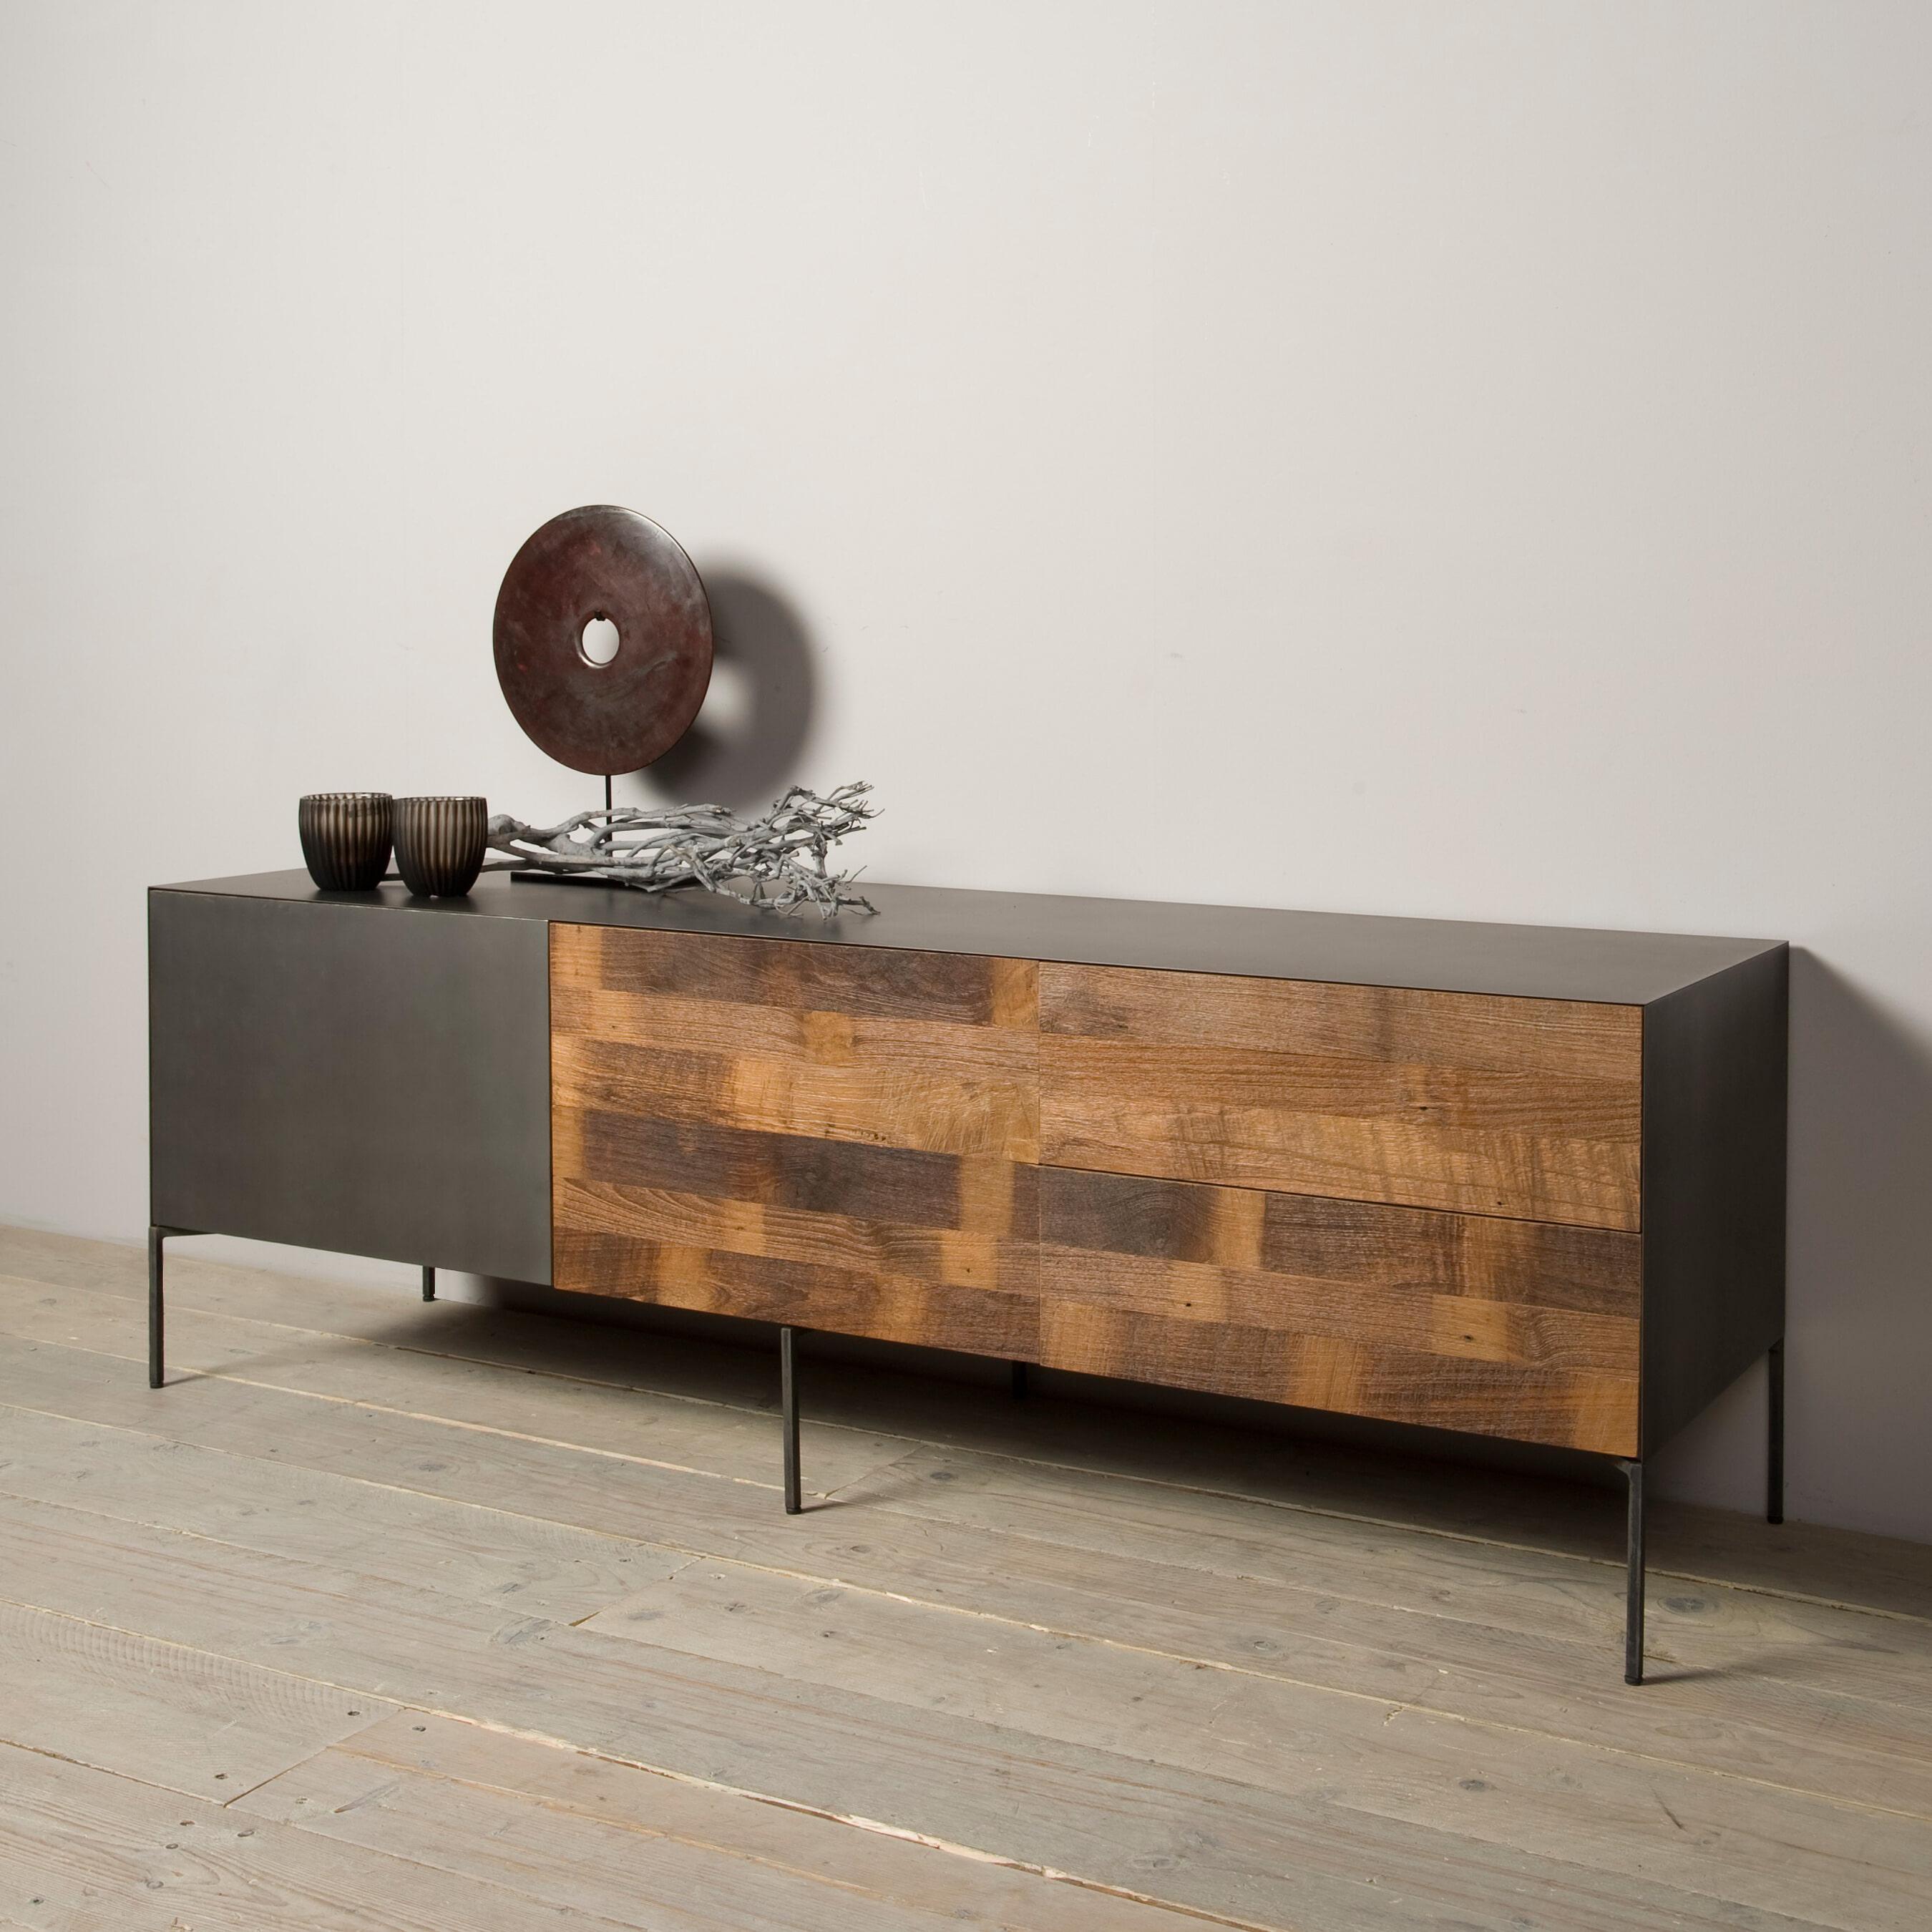 Tower Living Tv-meubel 'Pandora' 165cm